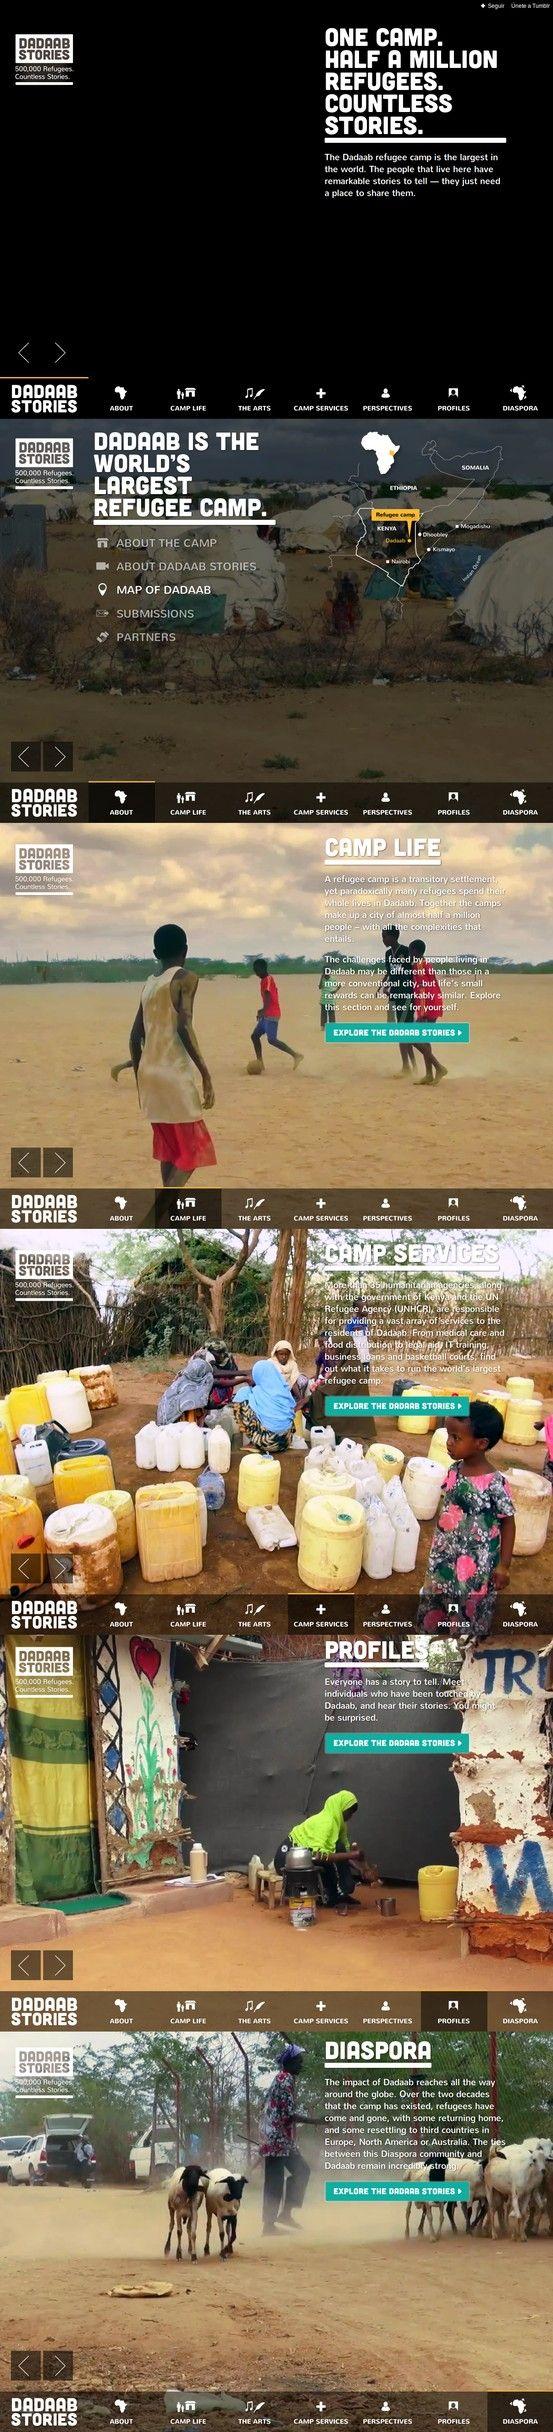 Dadaab Stories 25 April 2013 http://www.awwwards.com/web-design-awards/dadaab-stories #webdesign #inspiration #UI #Clean #BigBackgroundImages #Singlepage #ResponsiveDesign #Fullscreen #Colorful #Yellow #Green